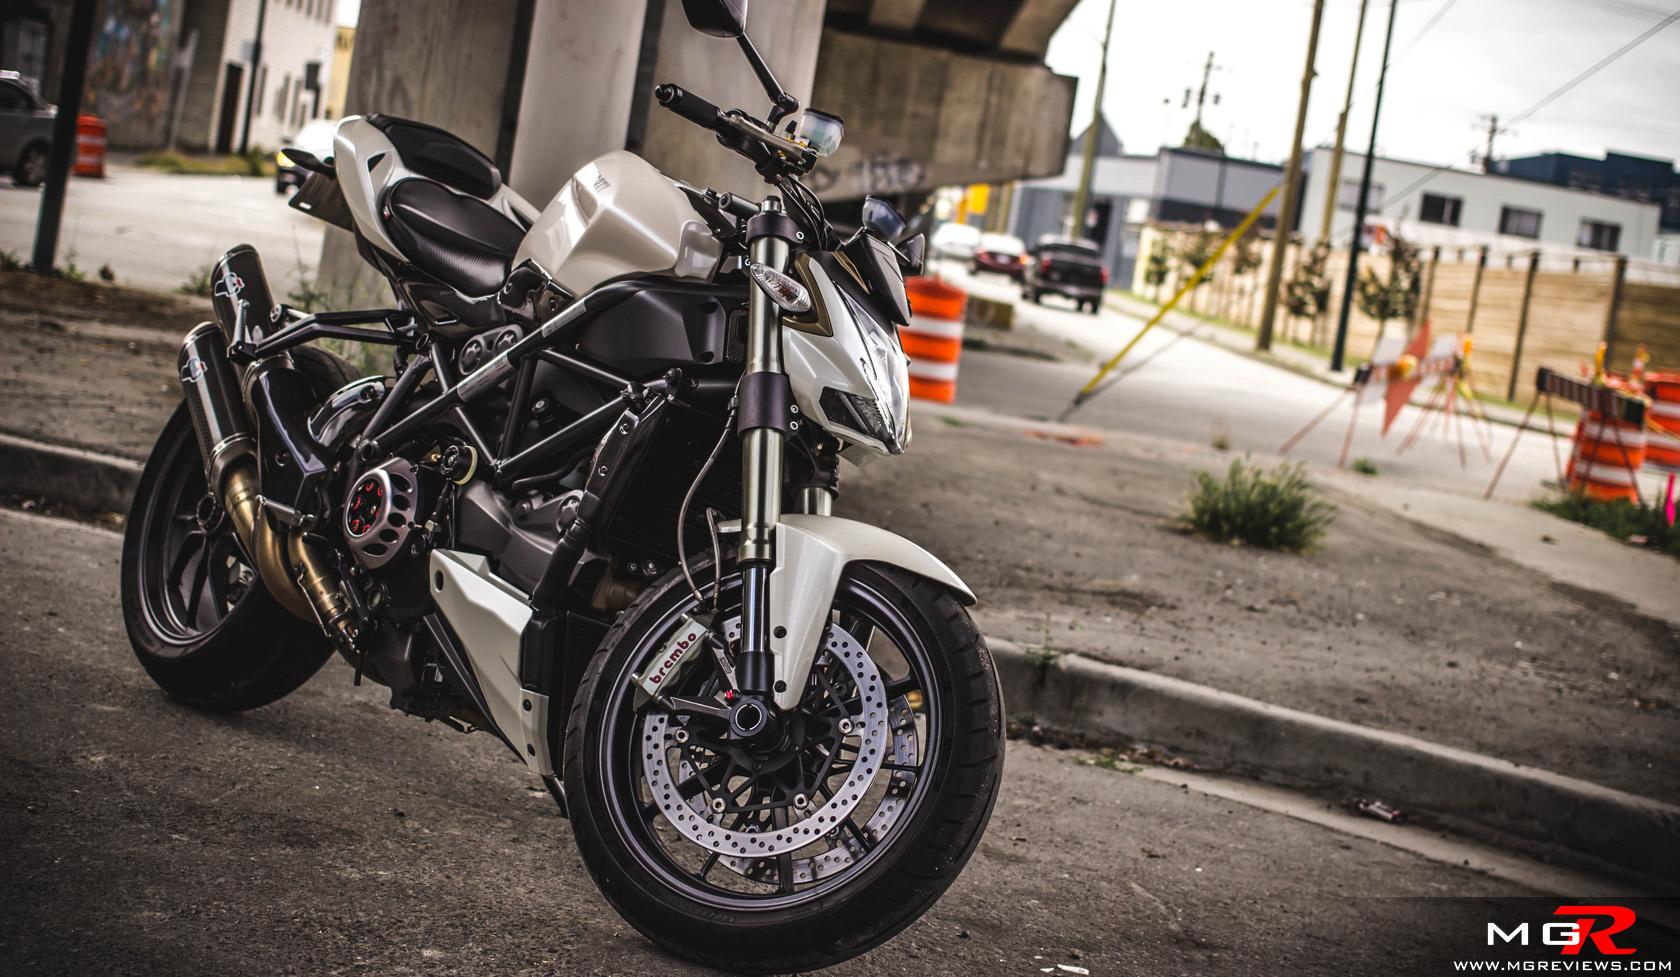 Ducati Streetfighter 1098 Wallpaper Full High Quality